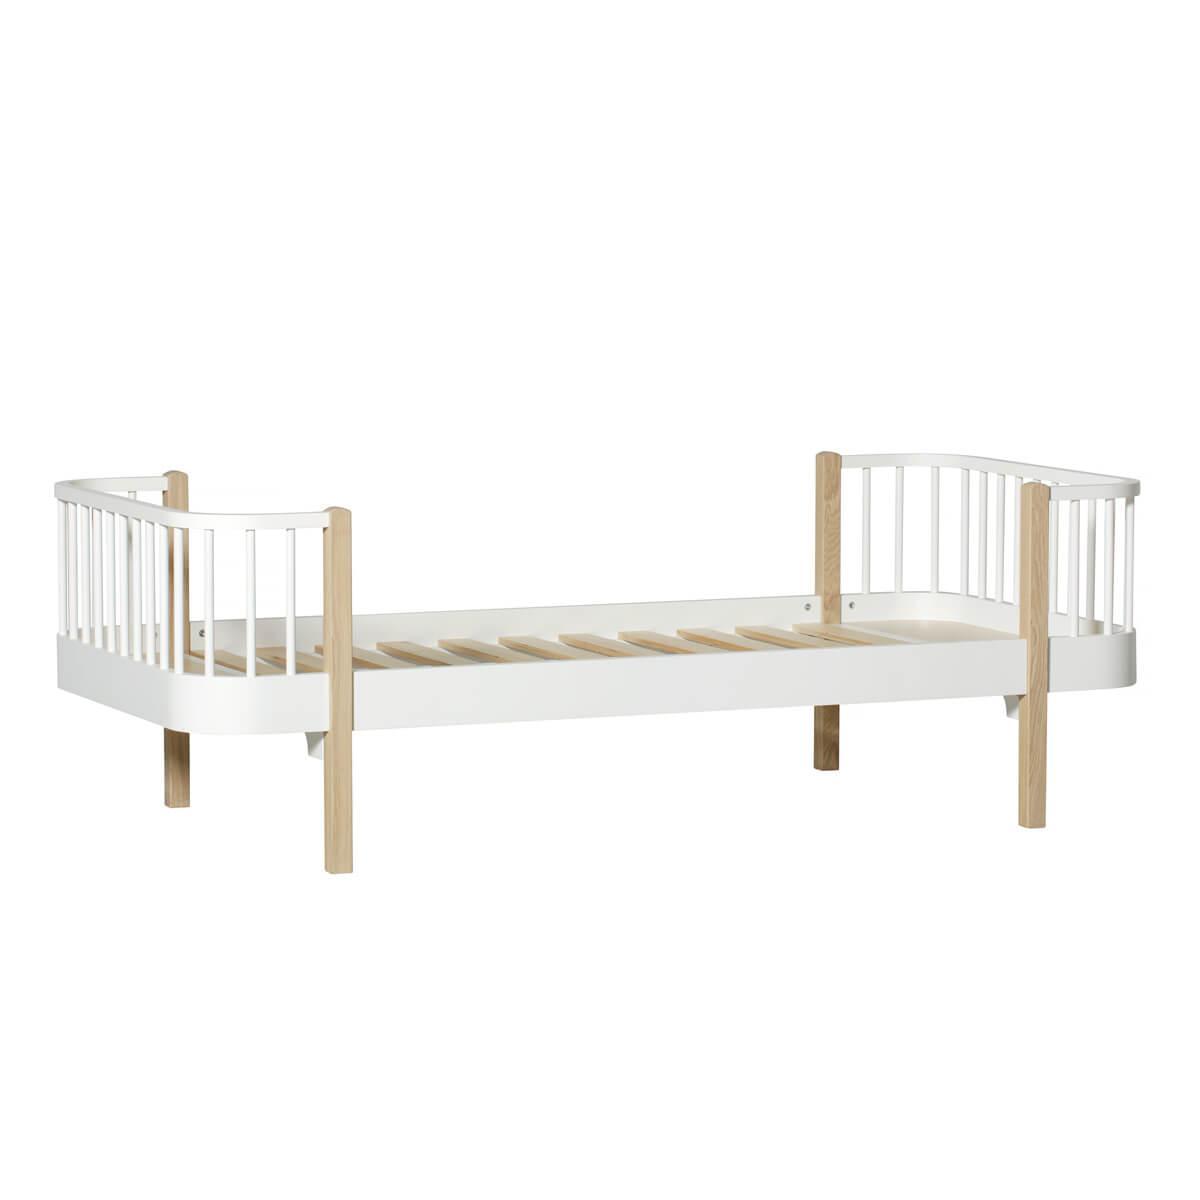 Lit bas évolutif 90x200cm WOOD Oliver Furniture blanc-chêne